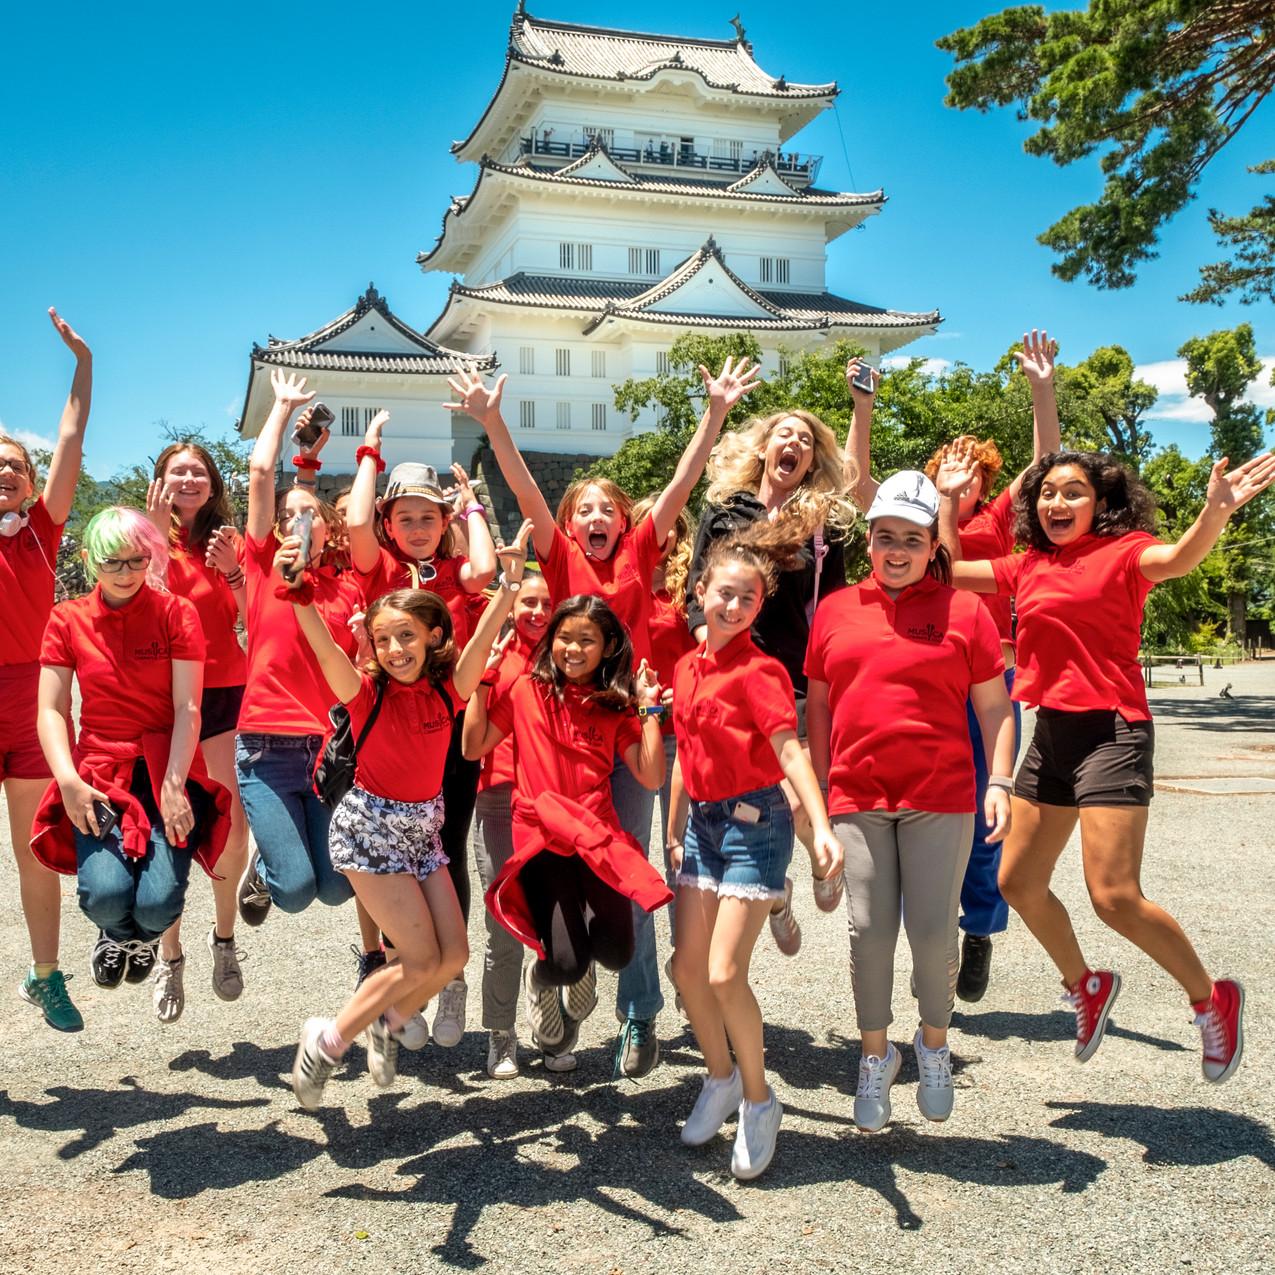 MUSYCA at Odawara Castle, Japan 2019